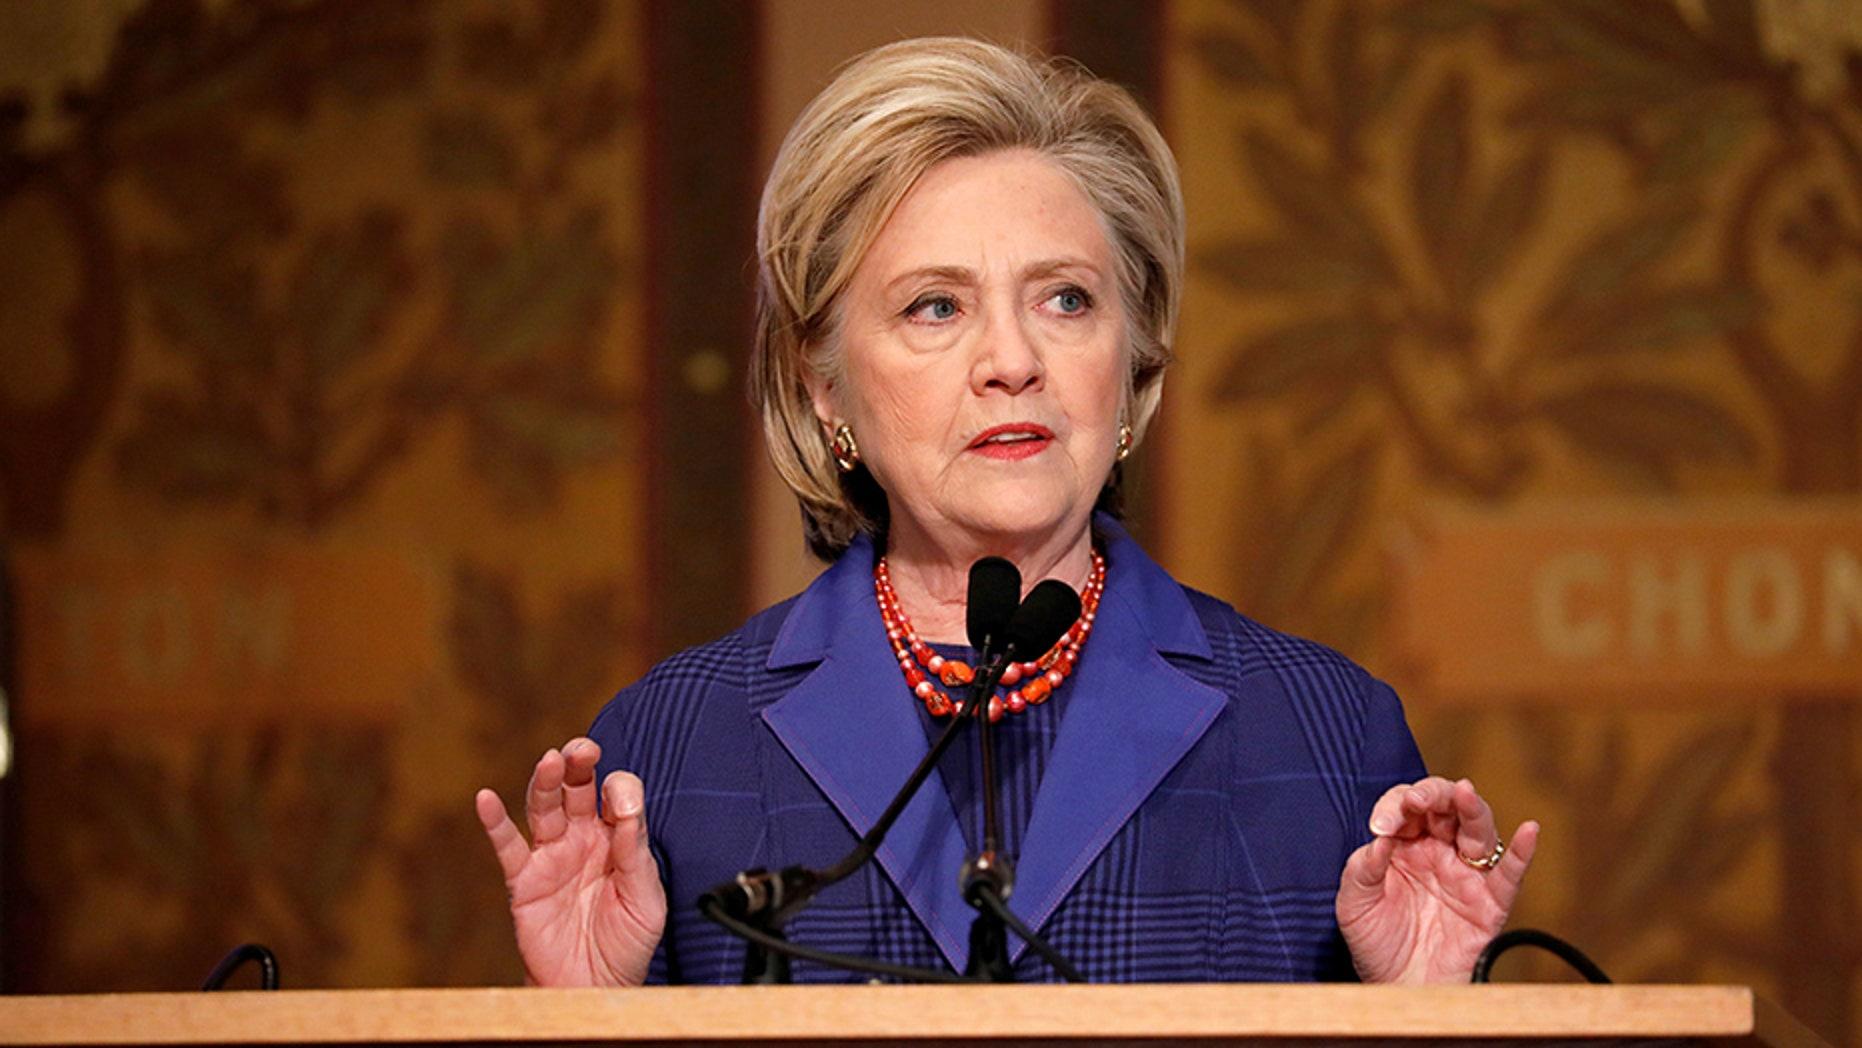 Hillary Clinton speaks at Georgetown University in Washington, Feb. 5, 2018.